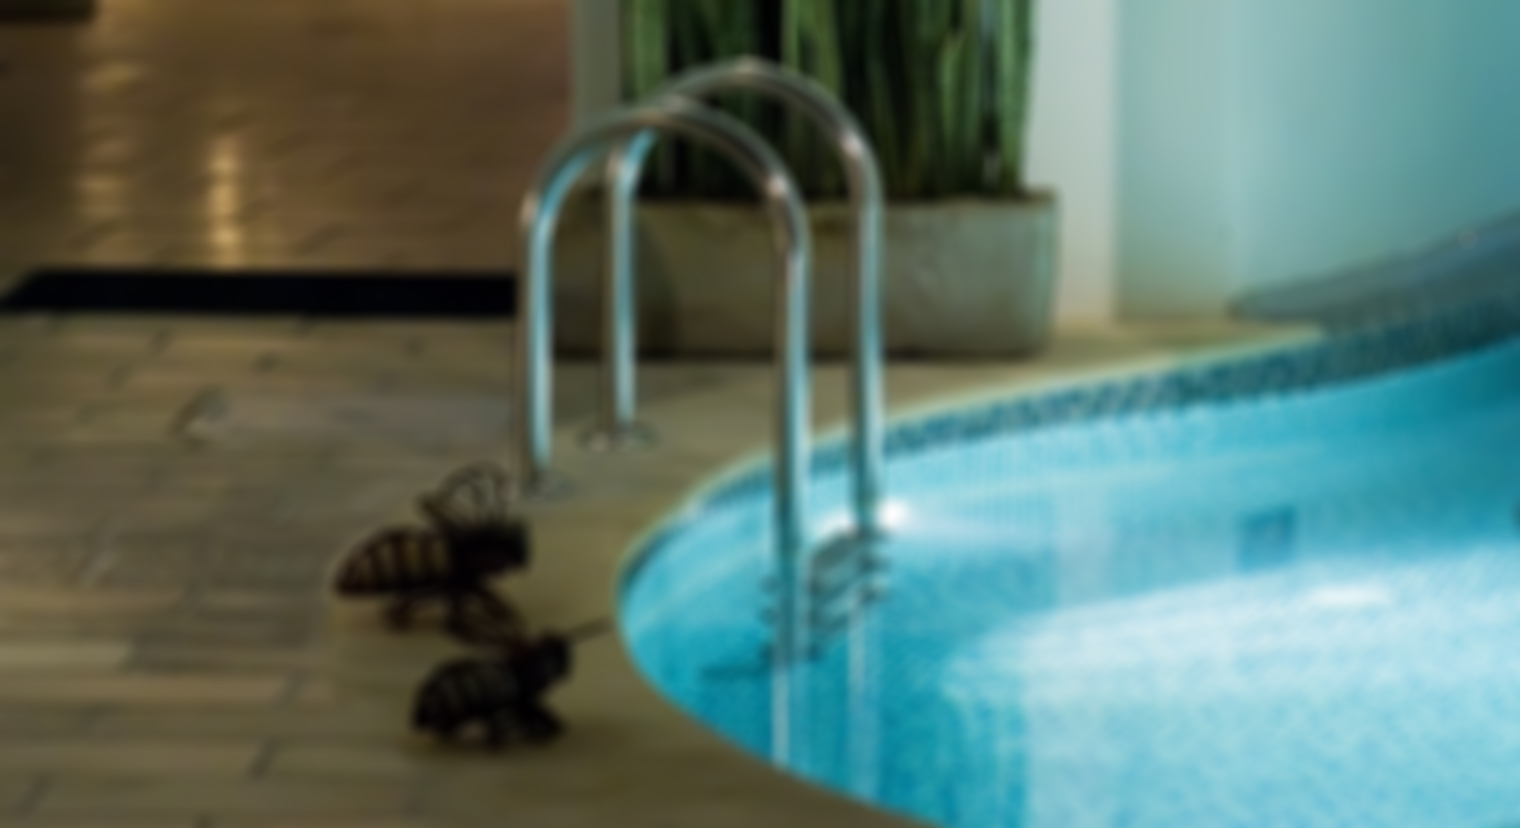 Hotel spa resurfacing aqua guard 5000 - Pool restoration ...